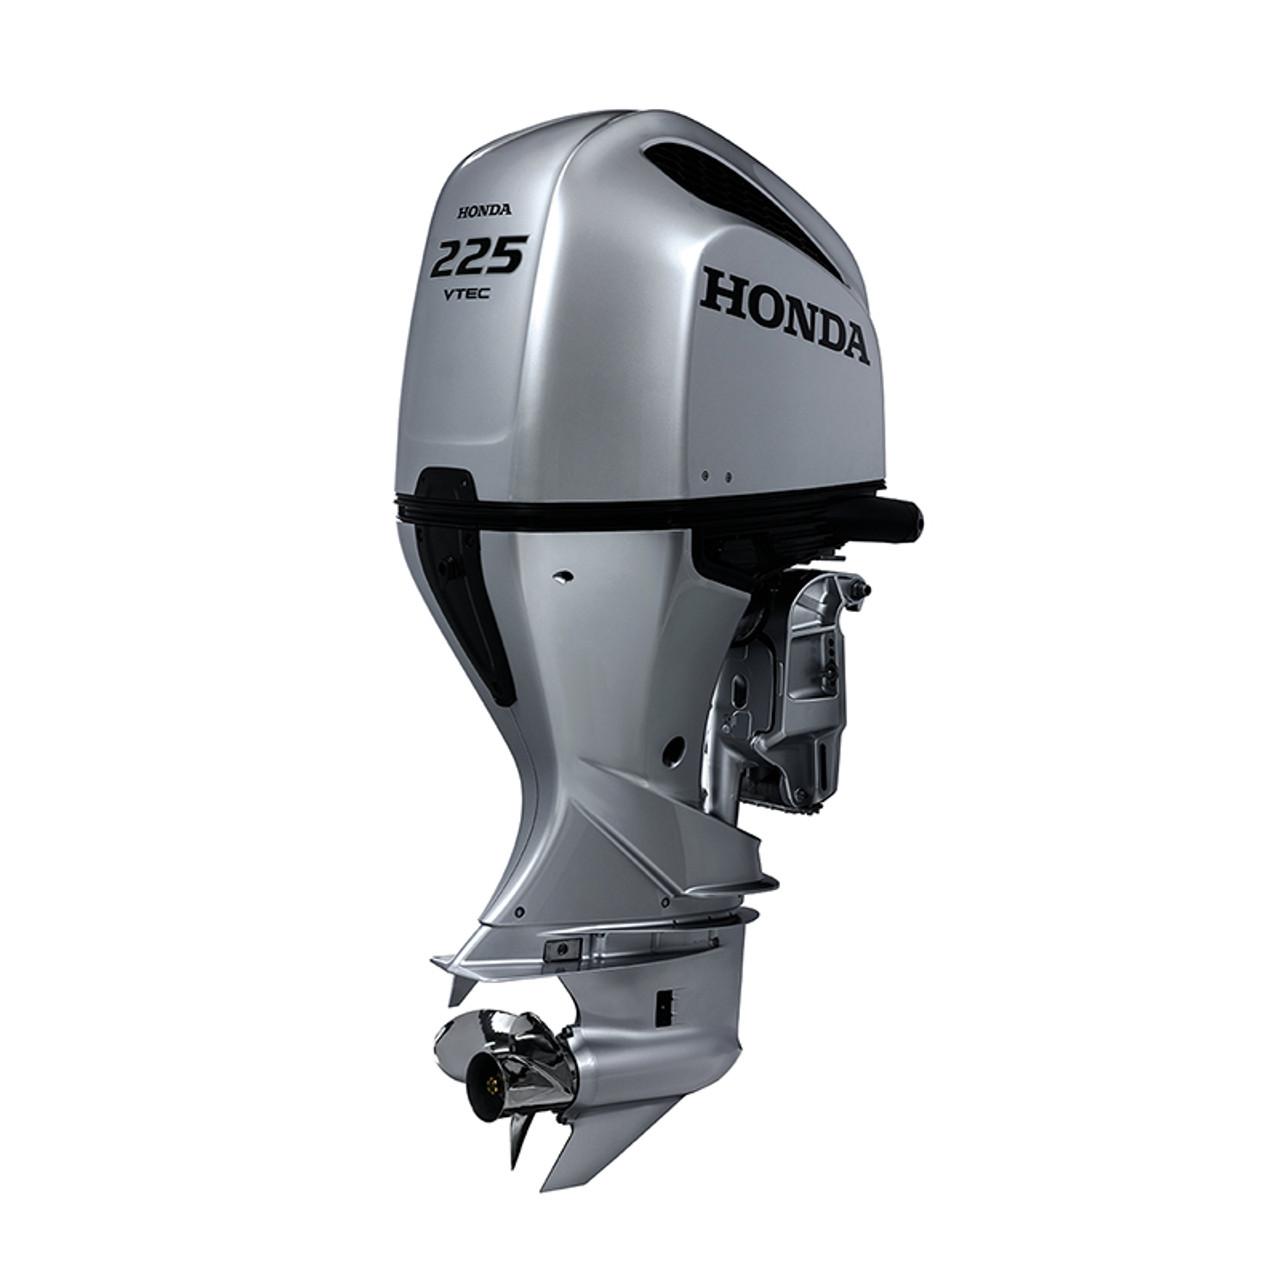 hight resolution of new 2019 honda bf225 4 stroke outboard motor